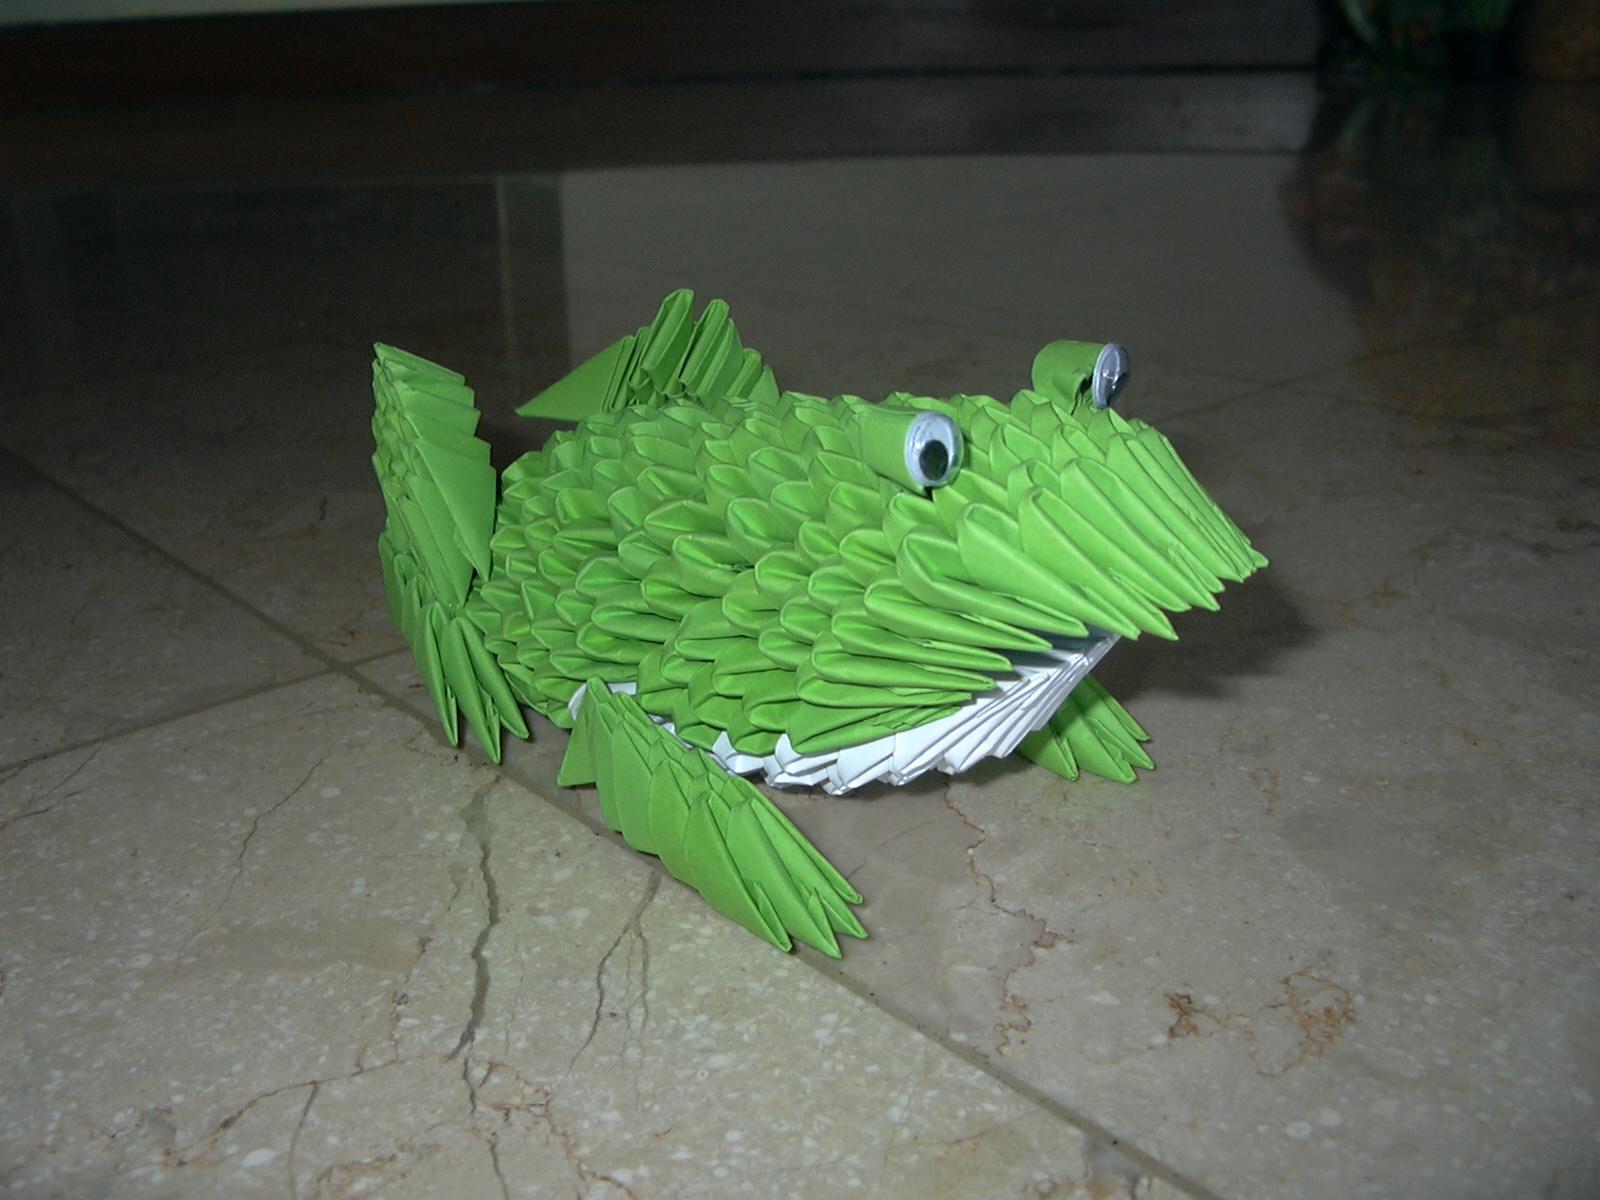 ICHANOKO 3D ORIGAMI INDONESIA: Model 3d origami - ANIMALS - photo#8